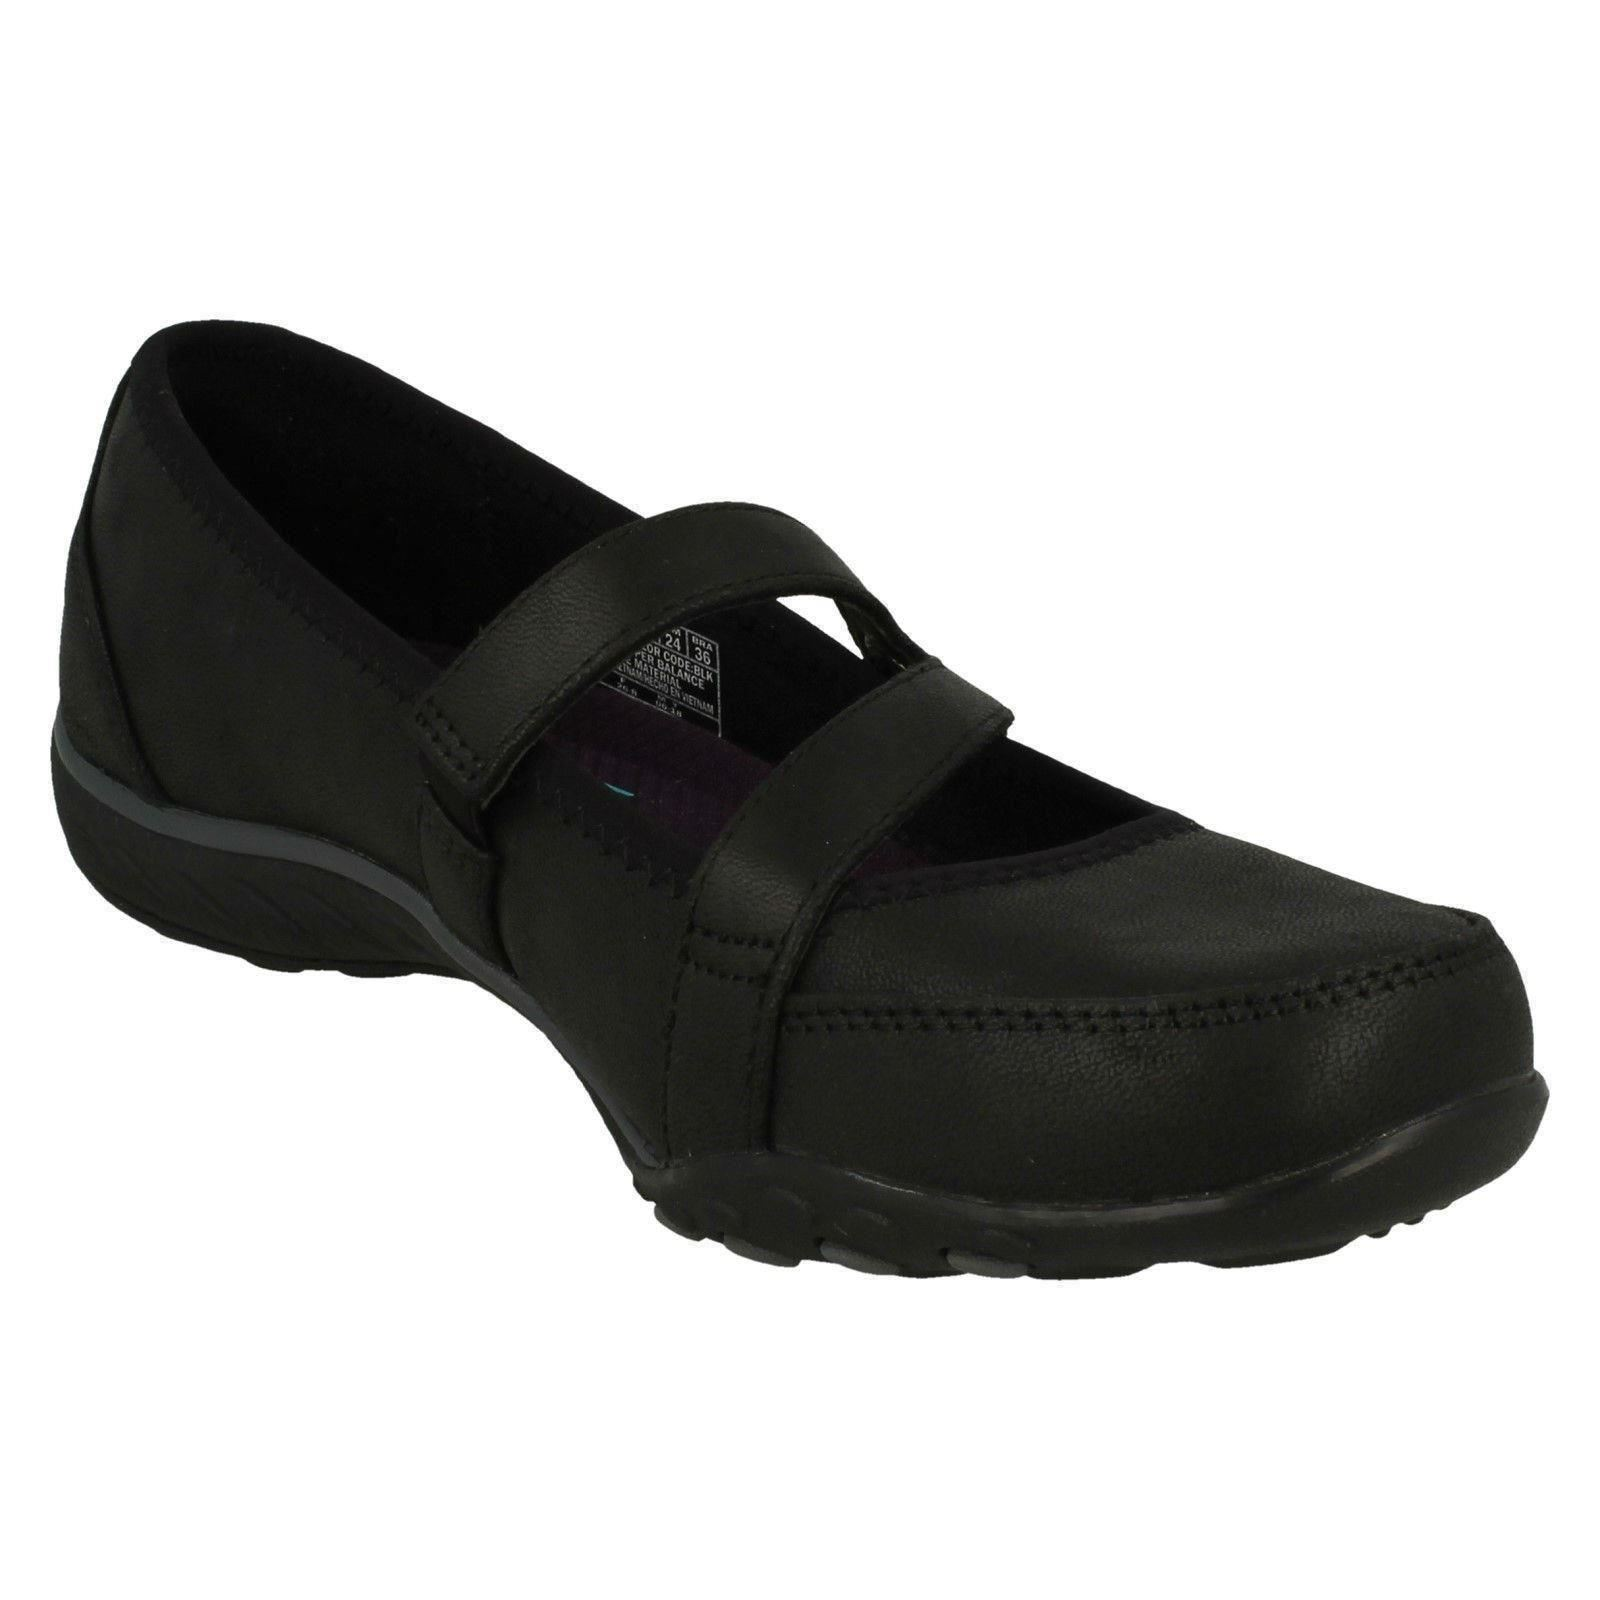 Calmly On Ladies Slip Black Flats Skechers 0EwPwqI